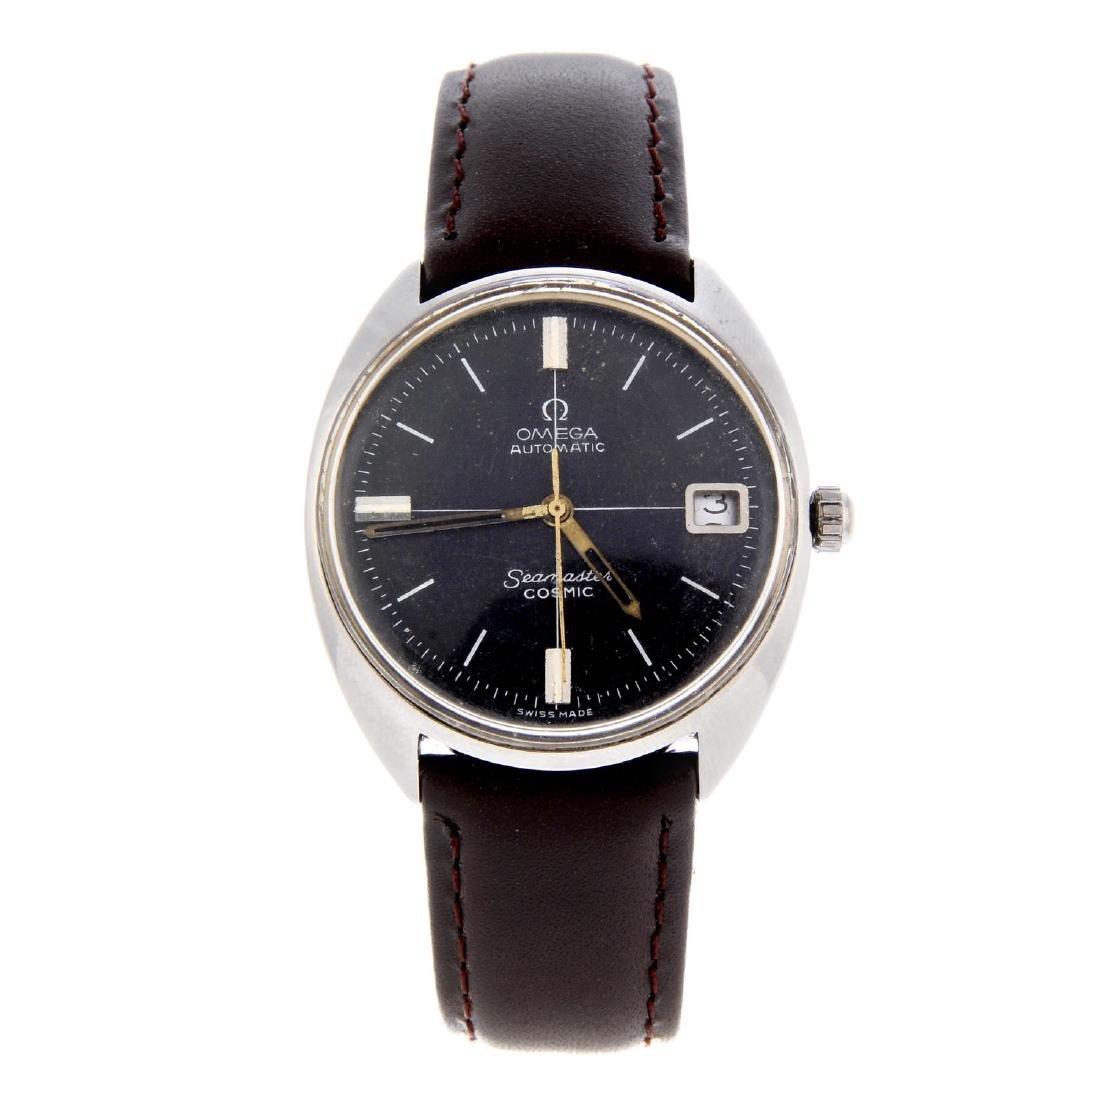 OMEGA - a gentleman's Seamaster Cosmic wrist watch.